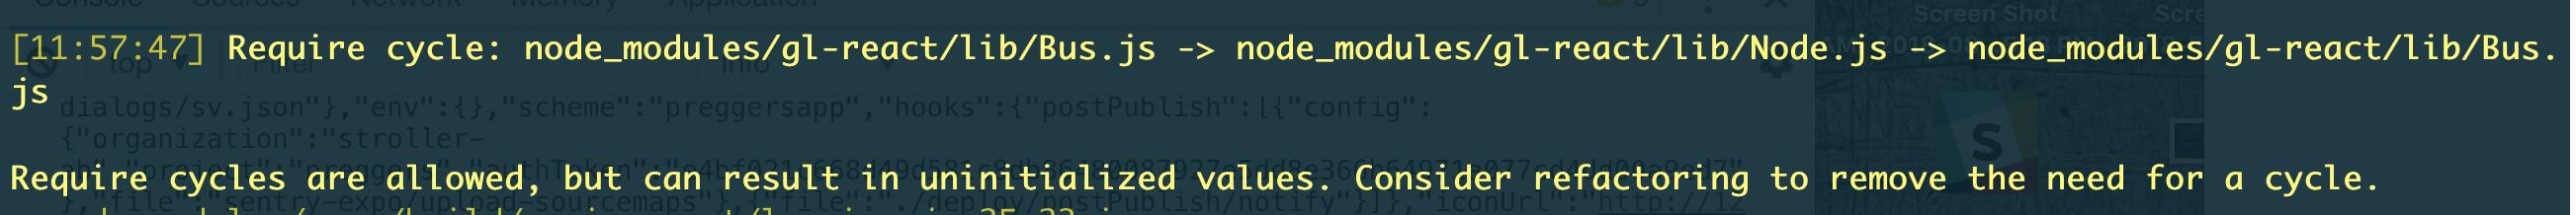 Require cycle: gl-react/lib/Bus js -> gl-react/lib/Node js -> gl